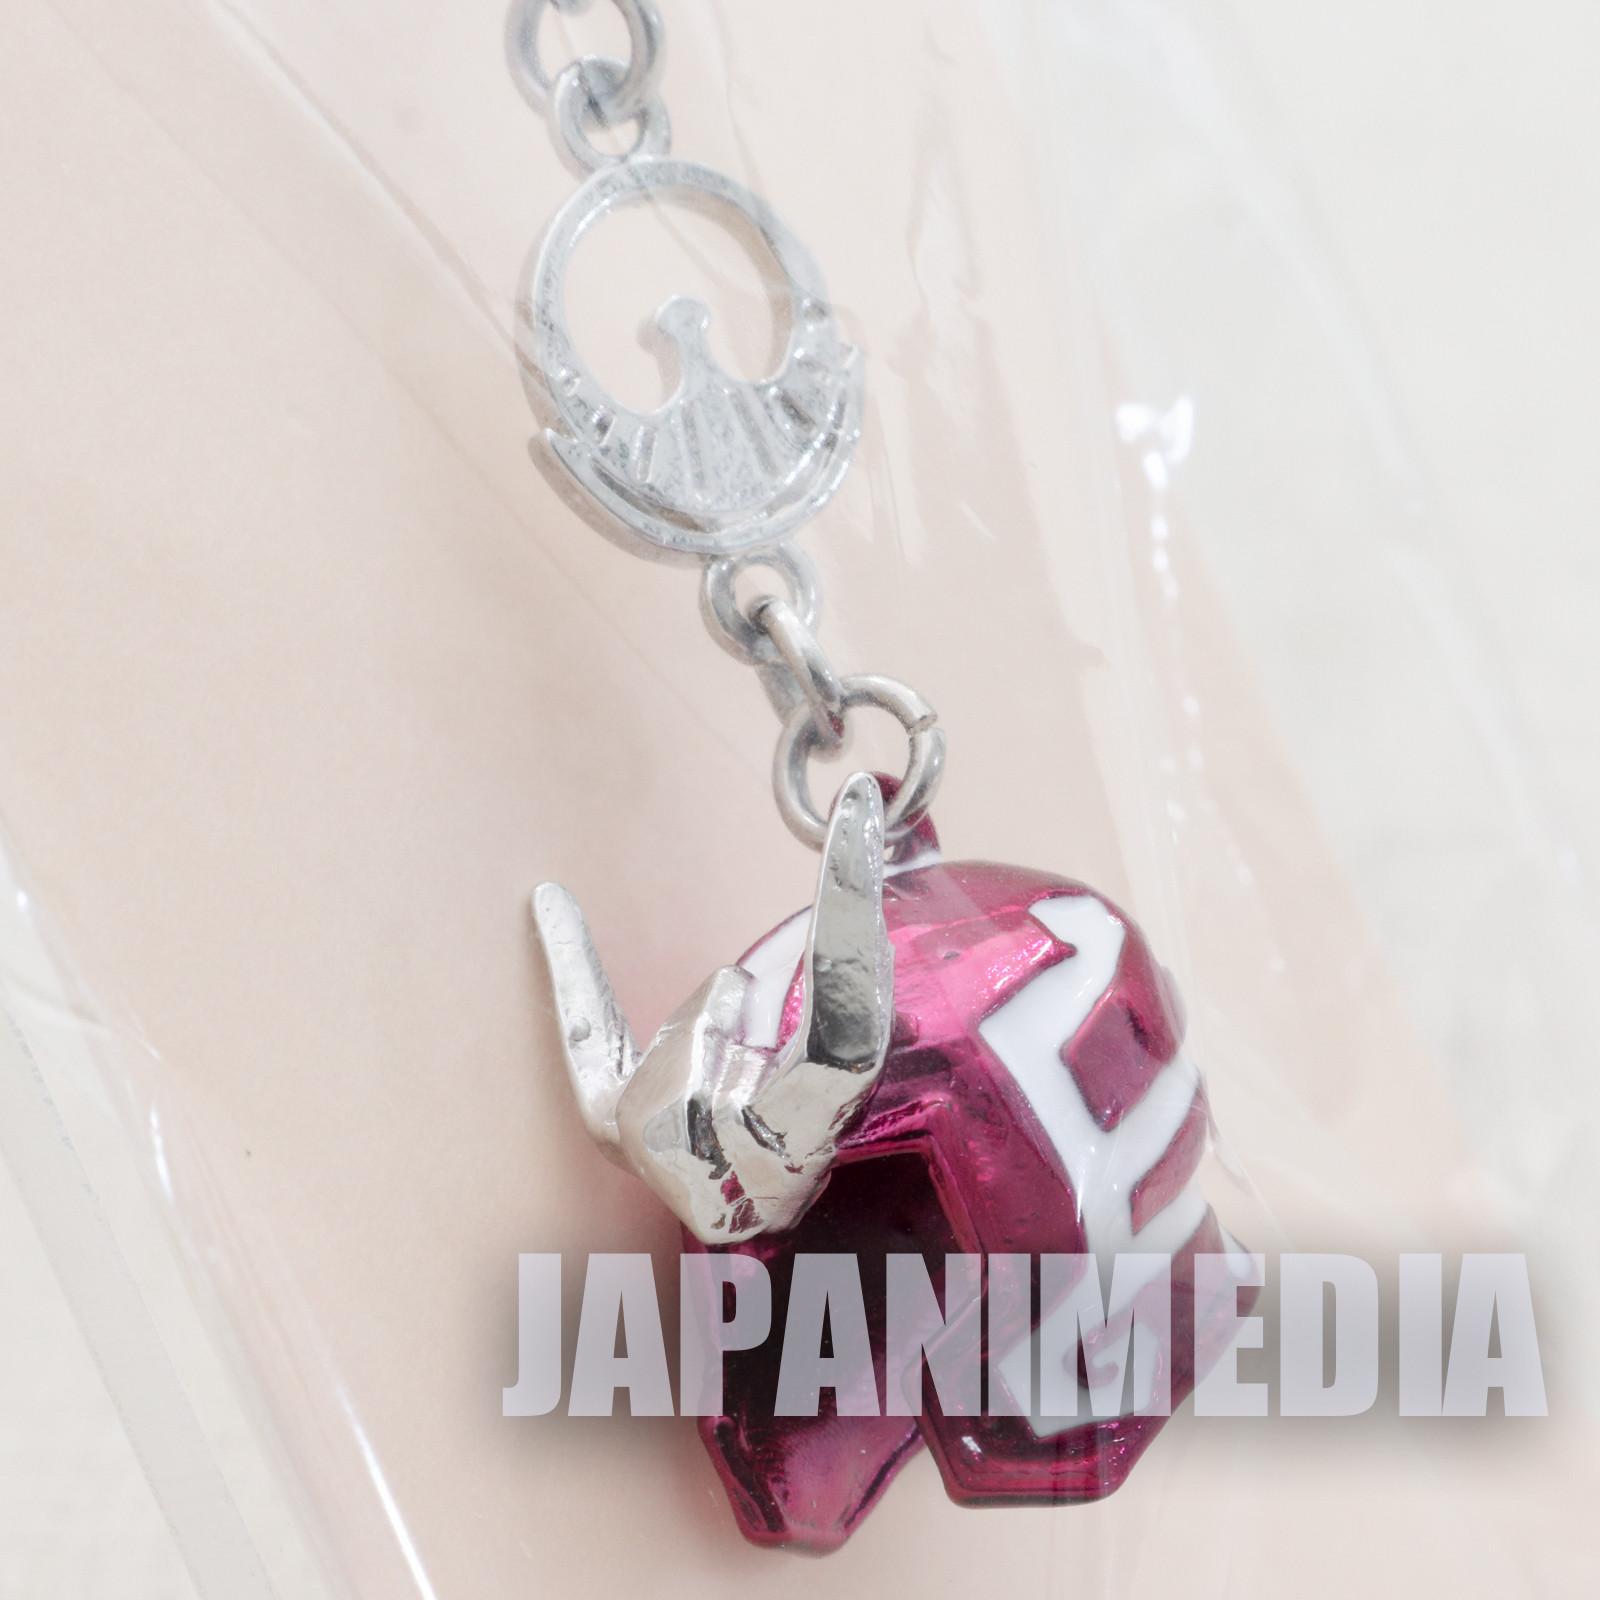 Saint Seiya Andromeda Shun Helmet Metal Mascot Charm BANDAI JAPAN ANIME